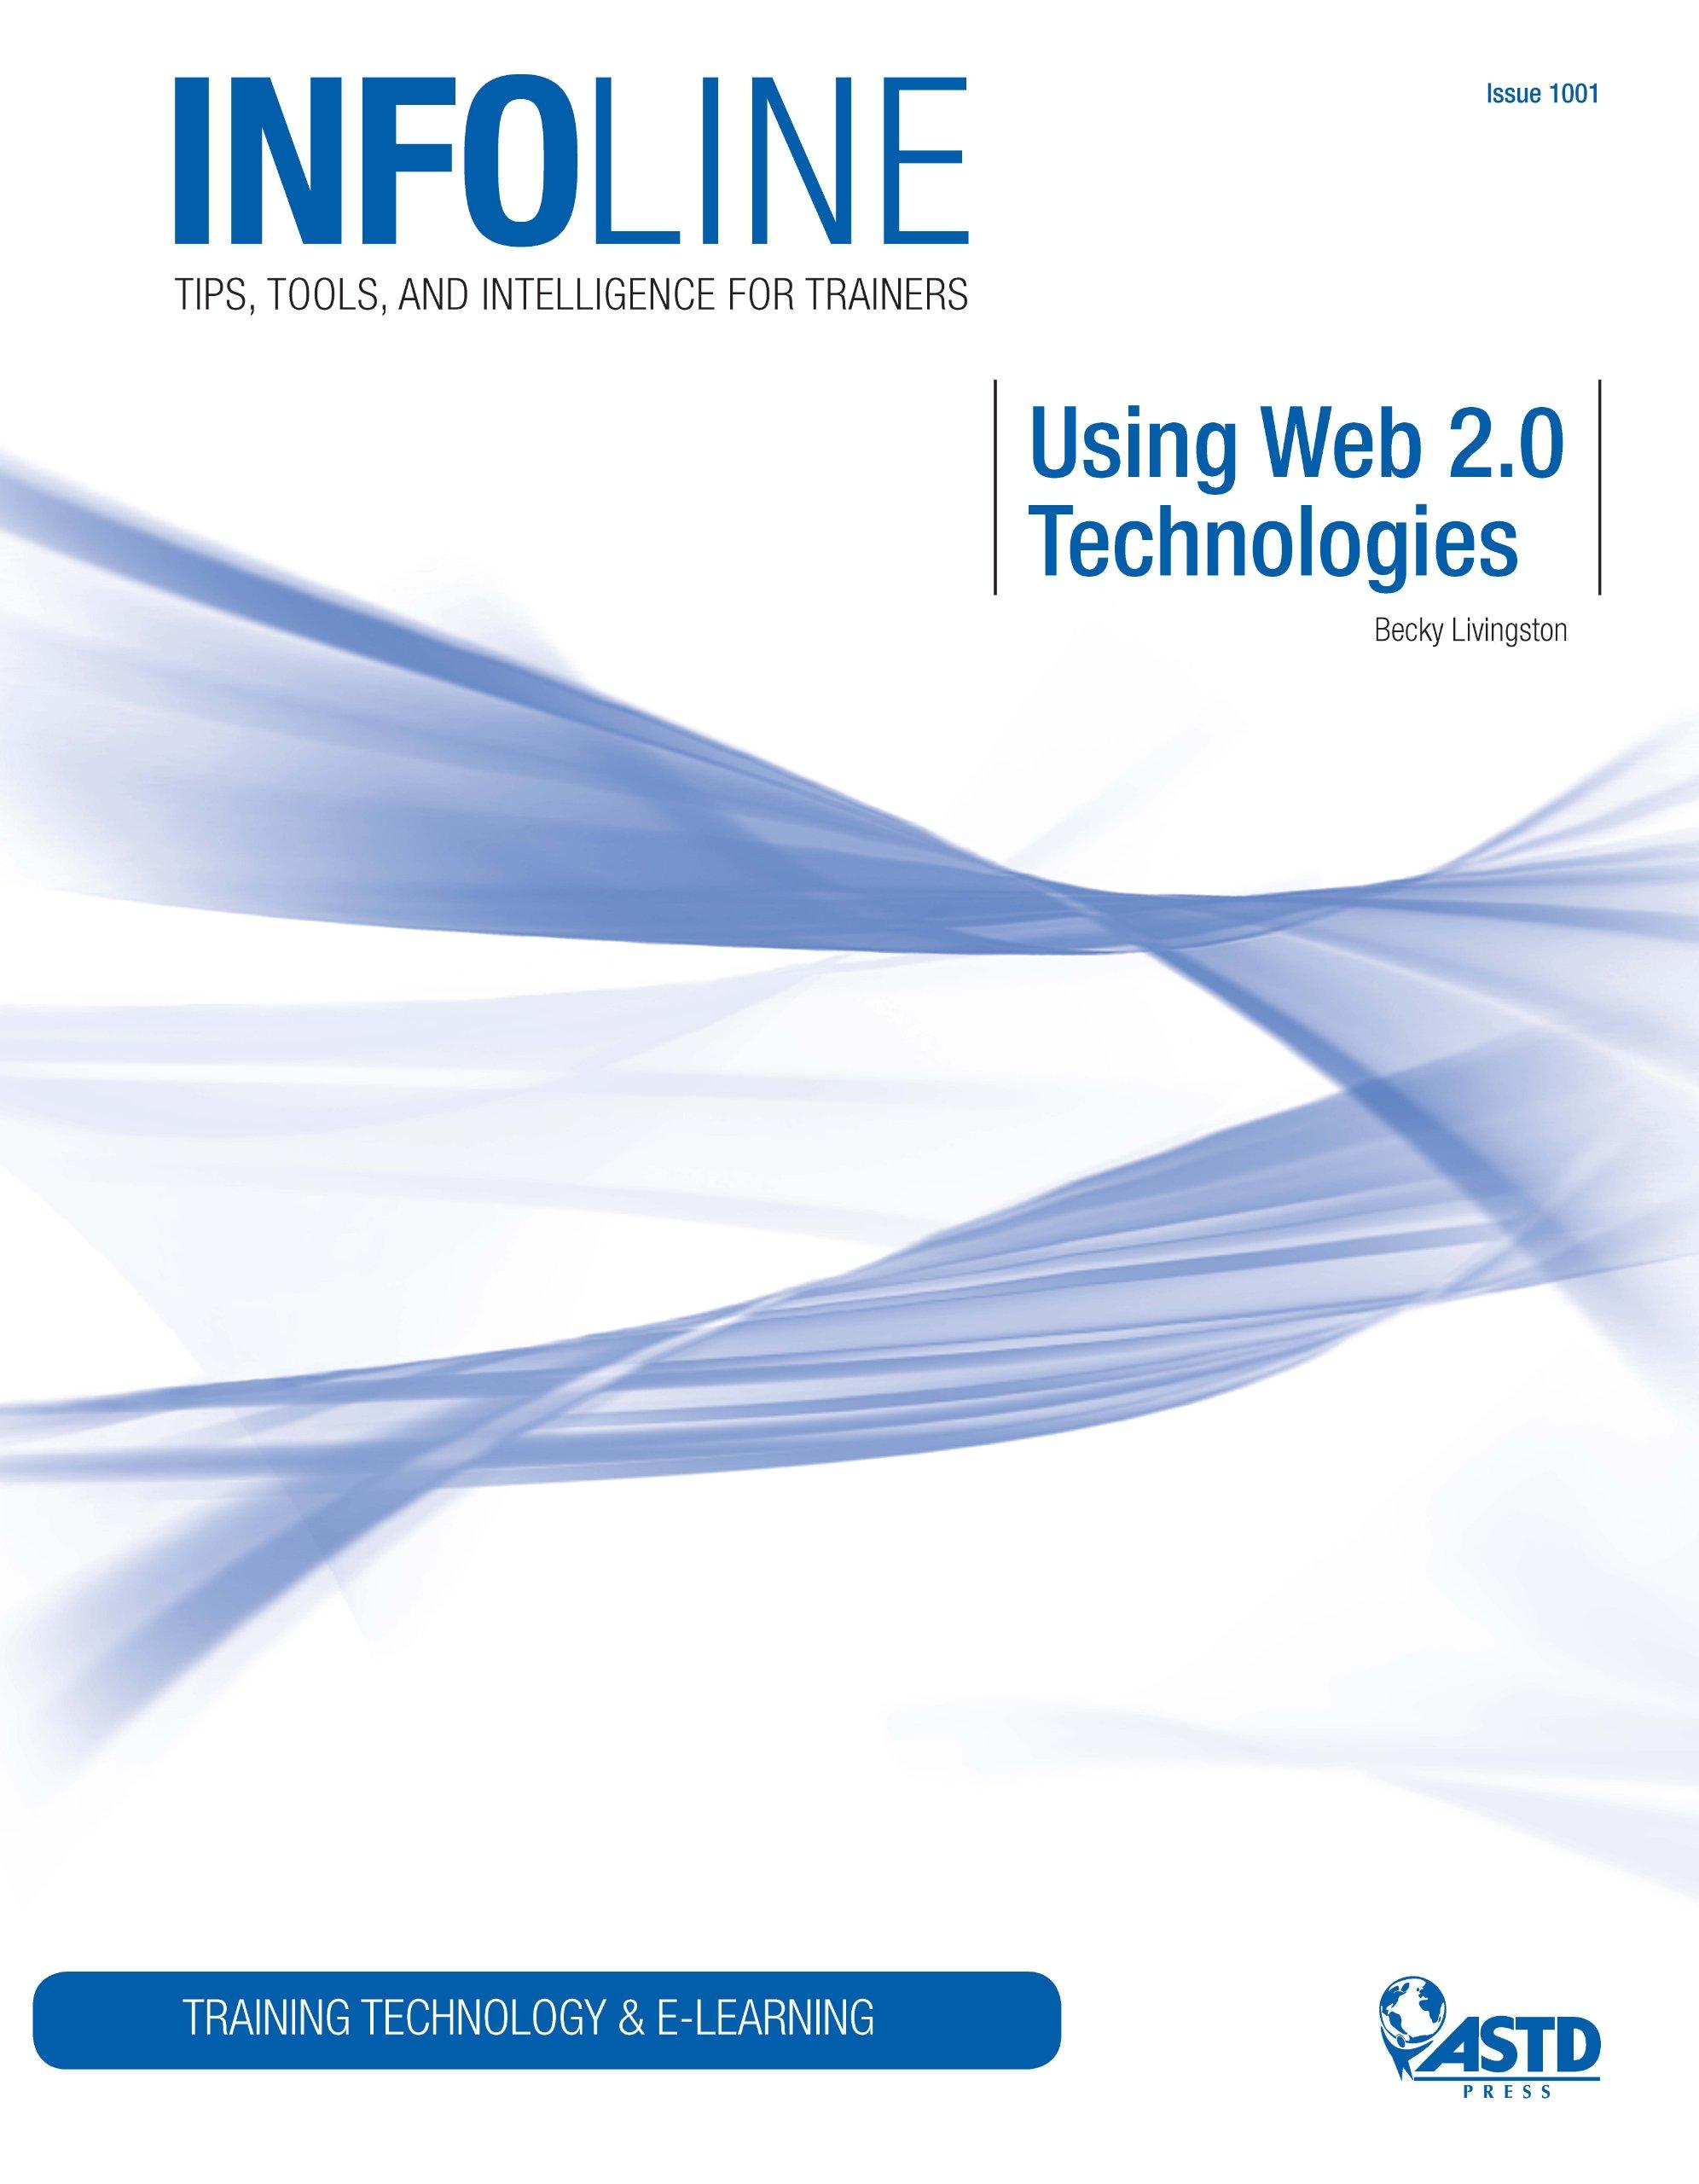 Using Web 2.0 Technologies (Infoline)